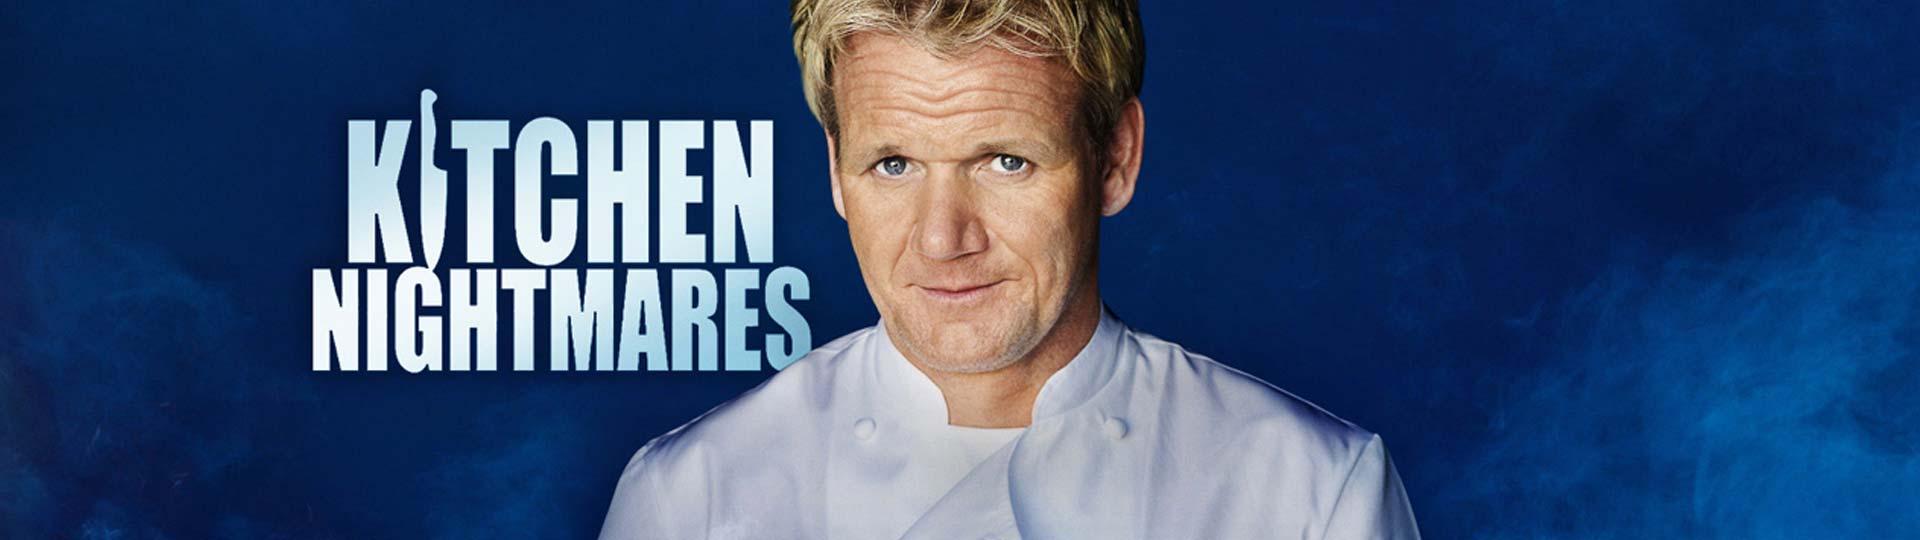 "Gordon Ramsay announces the end of ""Kitchen Nightmares"""